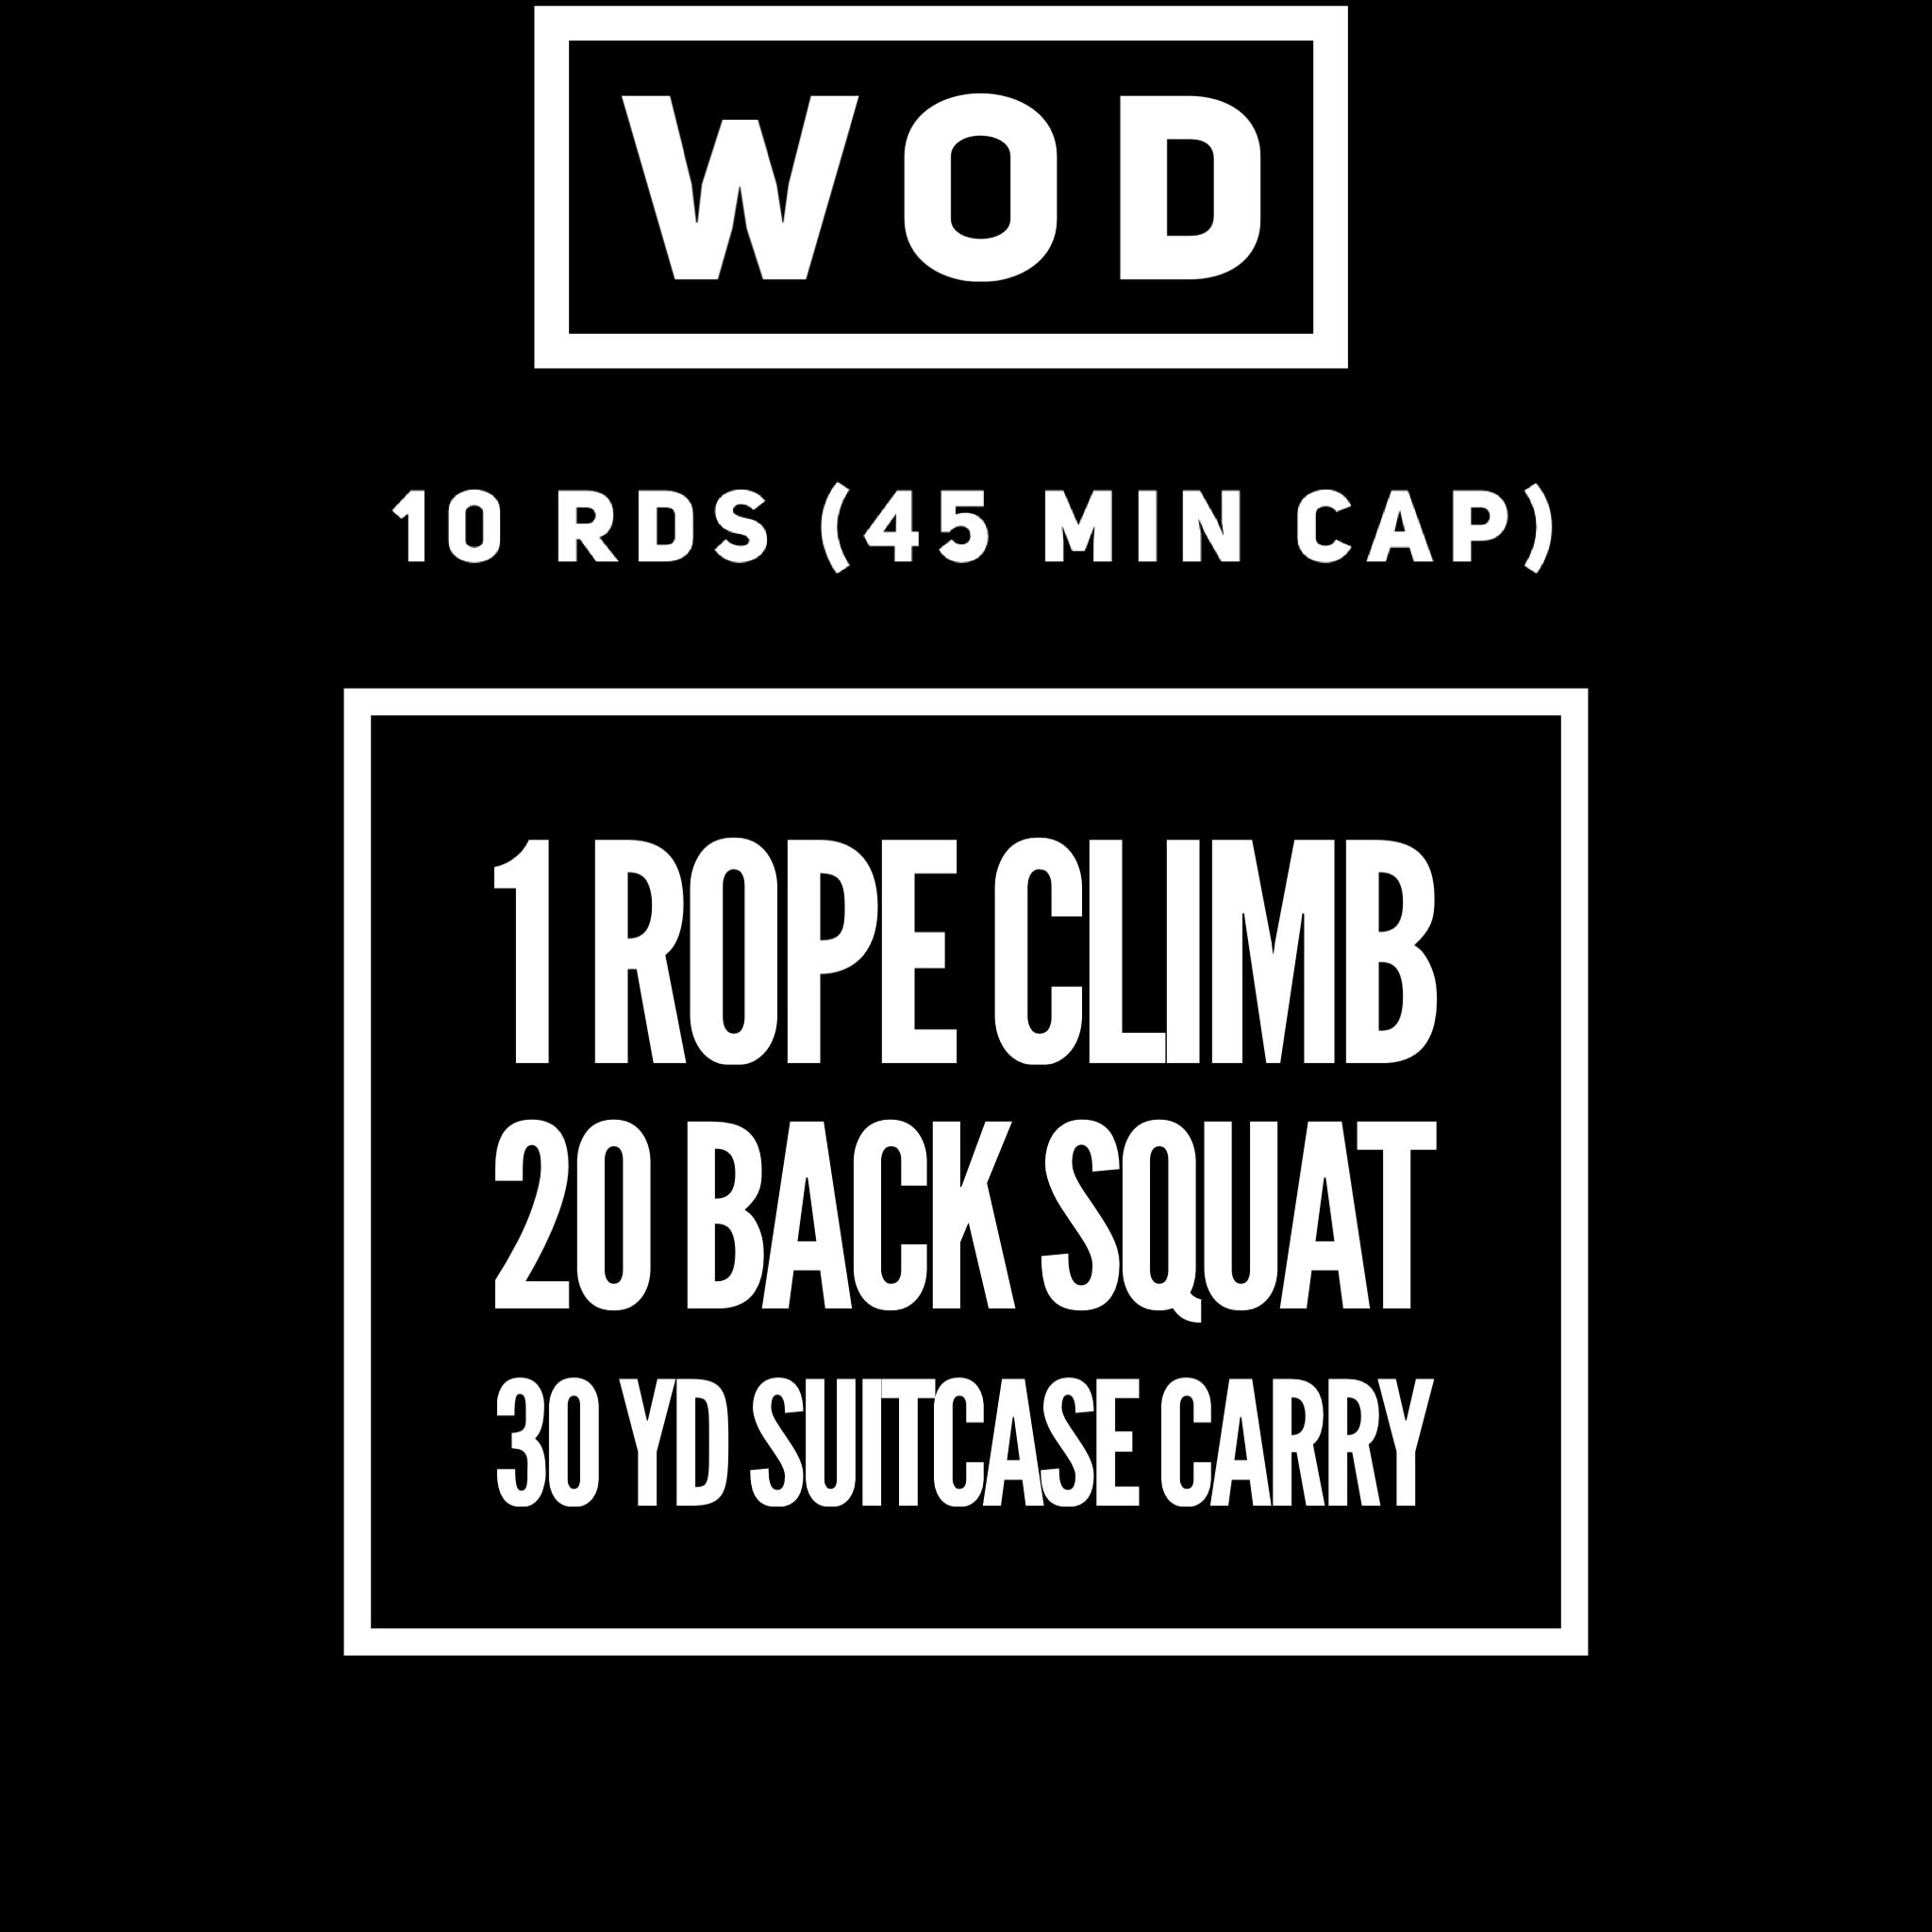 Back Squat @ 95/65  Carry KB @ 70/53